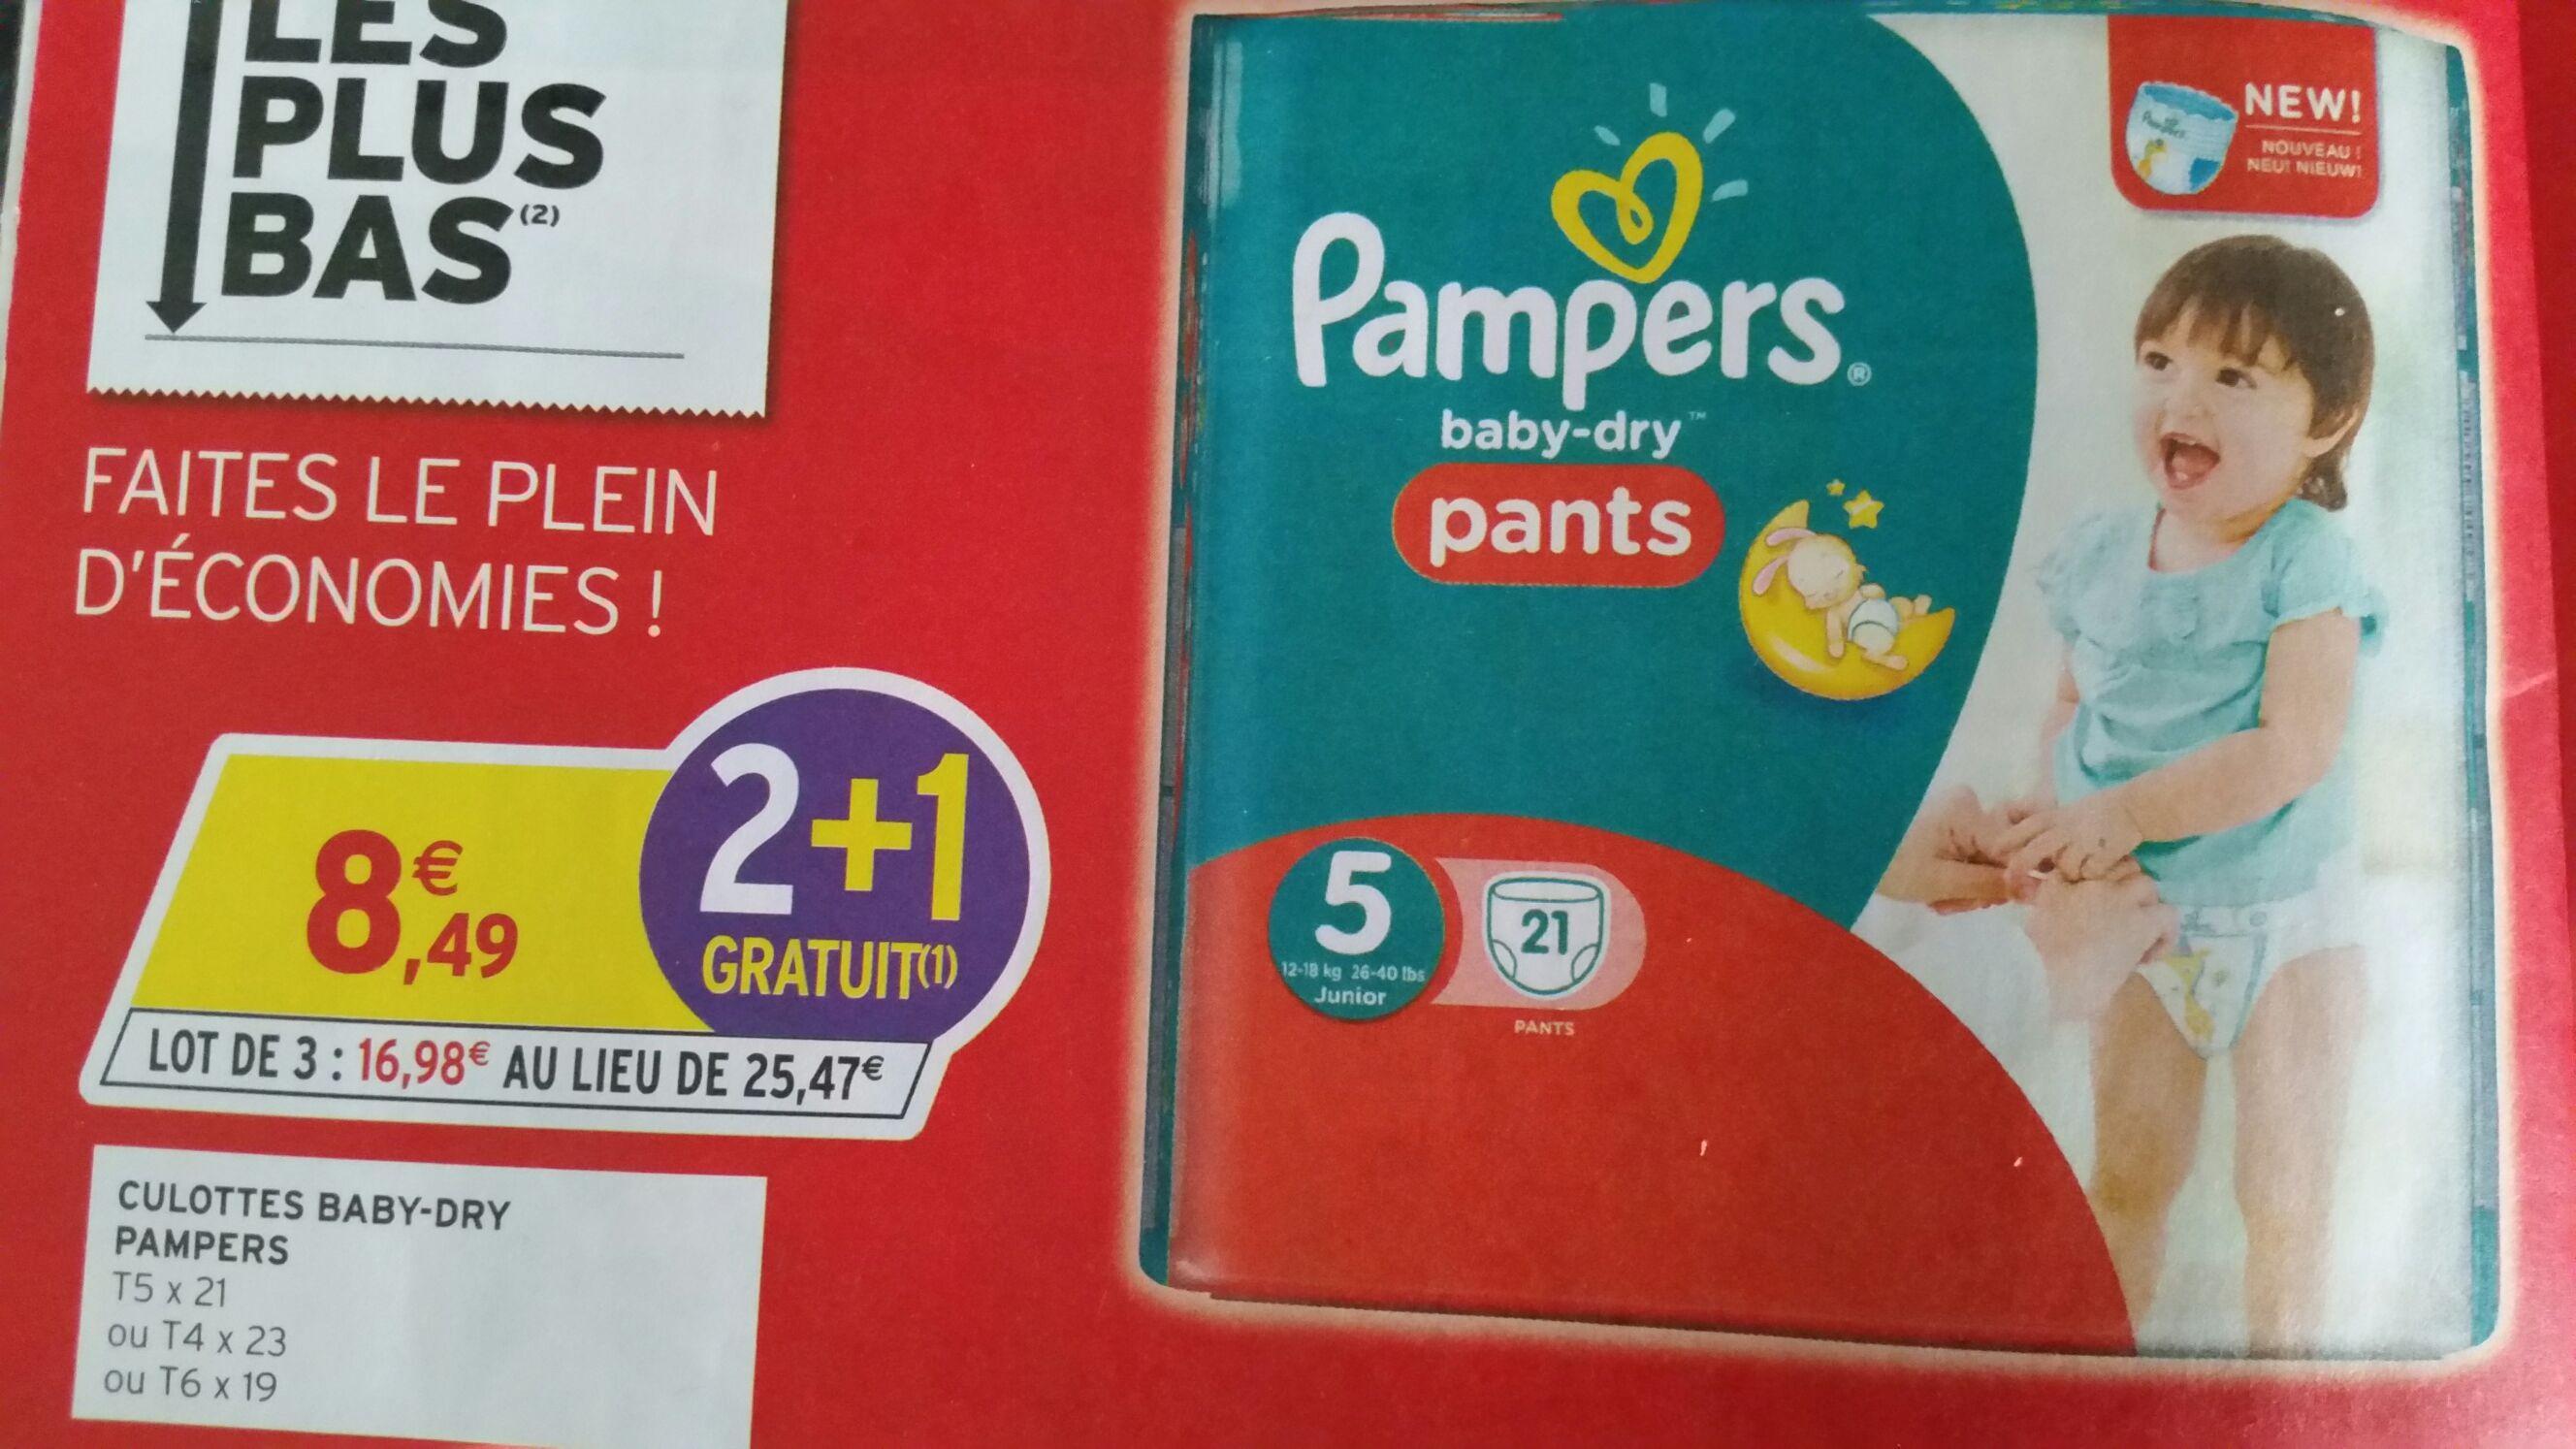 Lot de 3 Packs de 21 couches Pampers Baby Dry Pants (via appli Coupon Network)